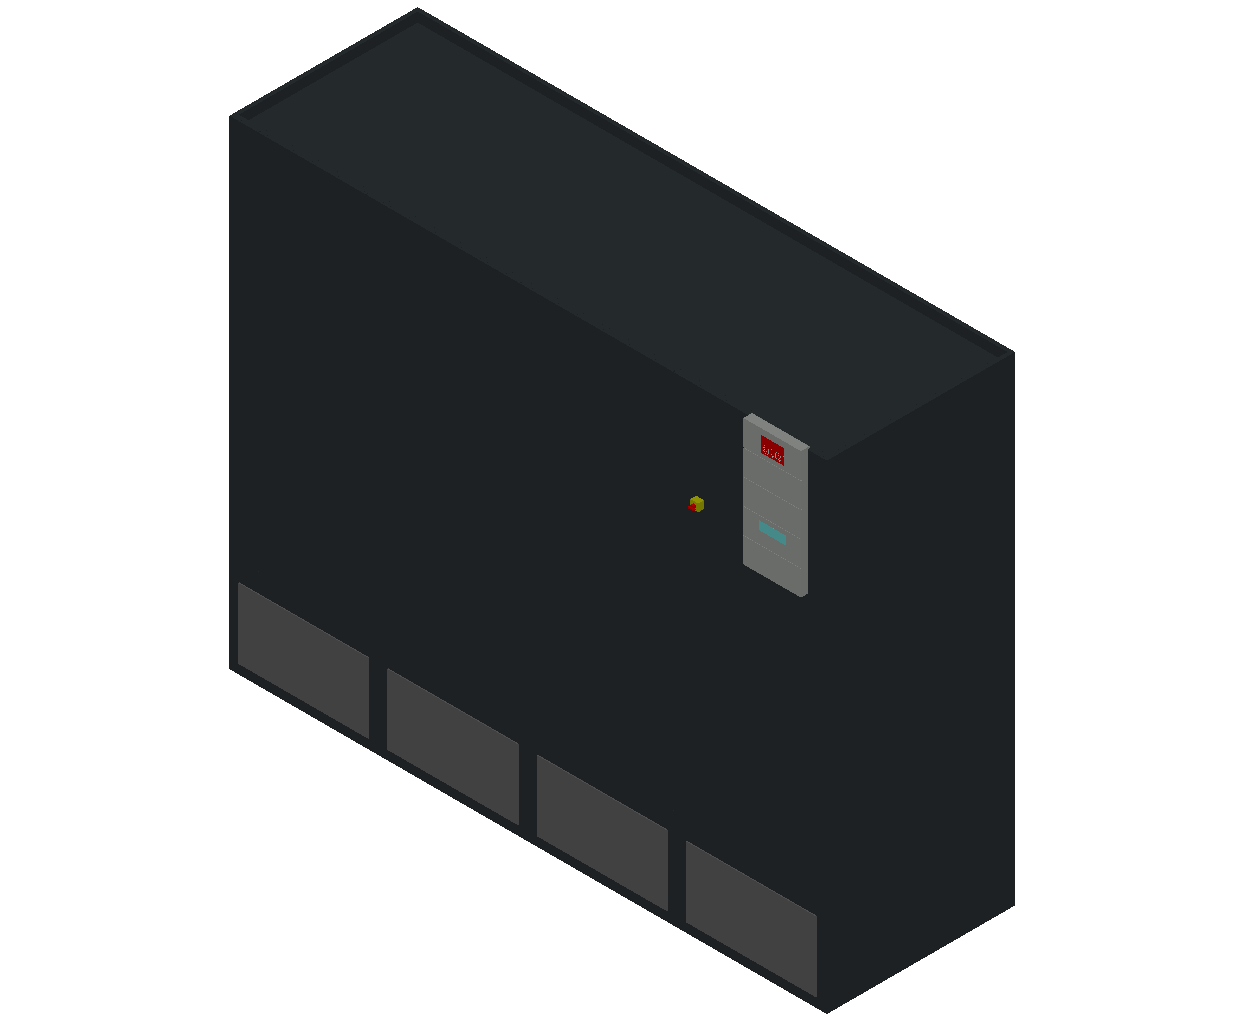 HC_Air Conditioner_Indoor Unit_MEPcontent_STULZ_CyberAir 3PRO_ALR_Dual Circuit GES_ALR_1802_GES_INT-EN.dwg